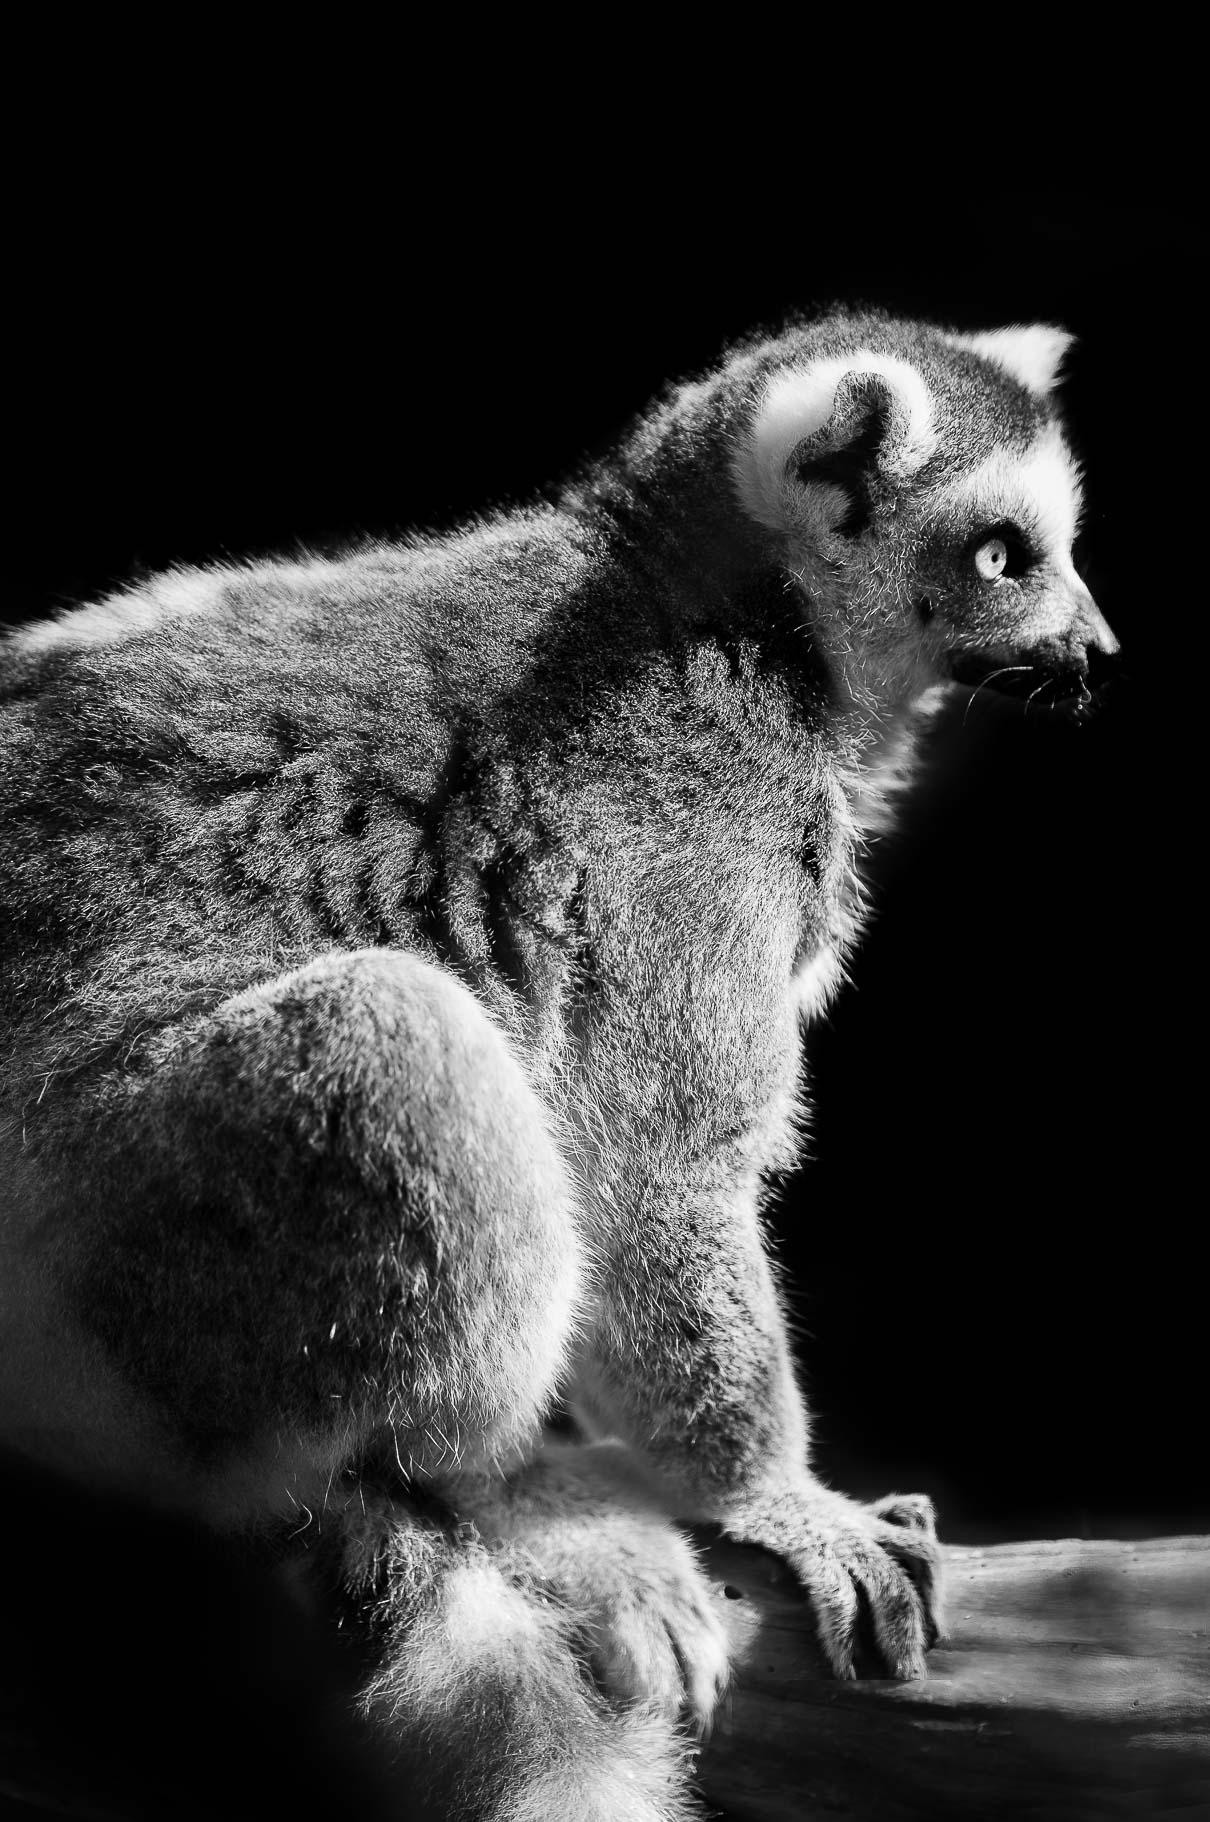 alexa-wright-photography-lemur.jpg